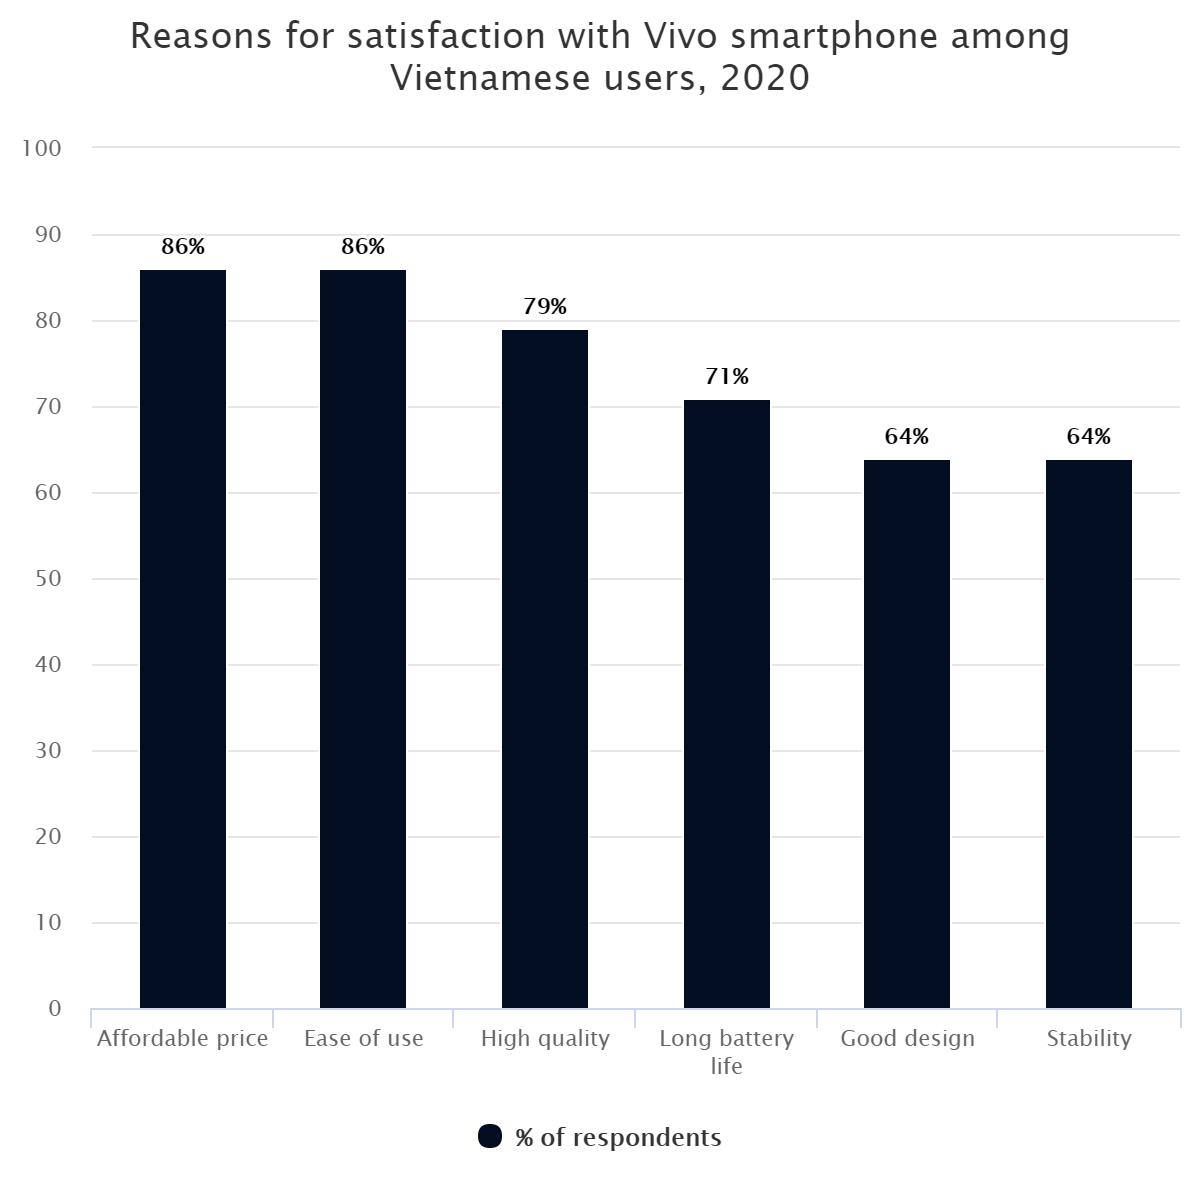 Reasons for satisfaction with Vivo smartphone among Vietnamese users, 2020